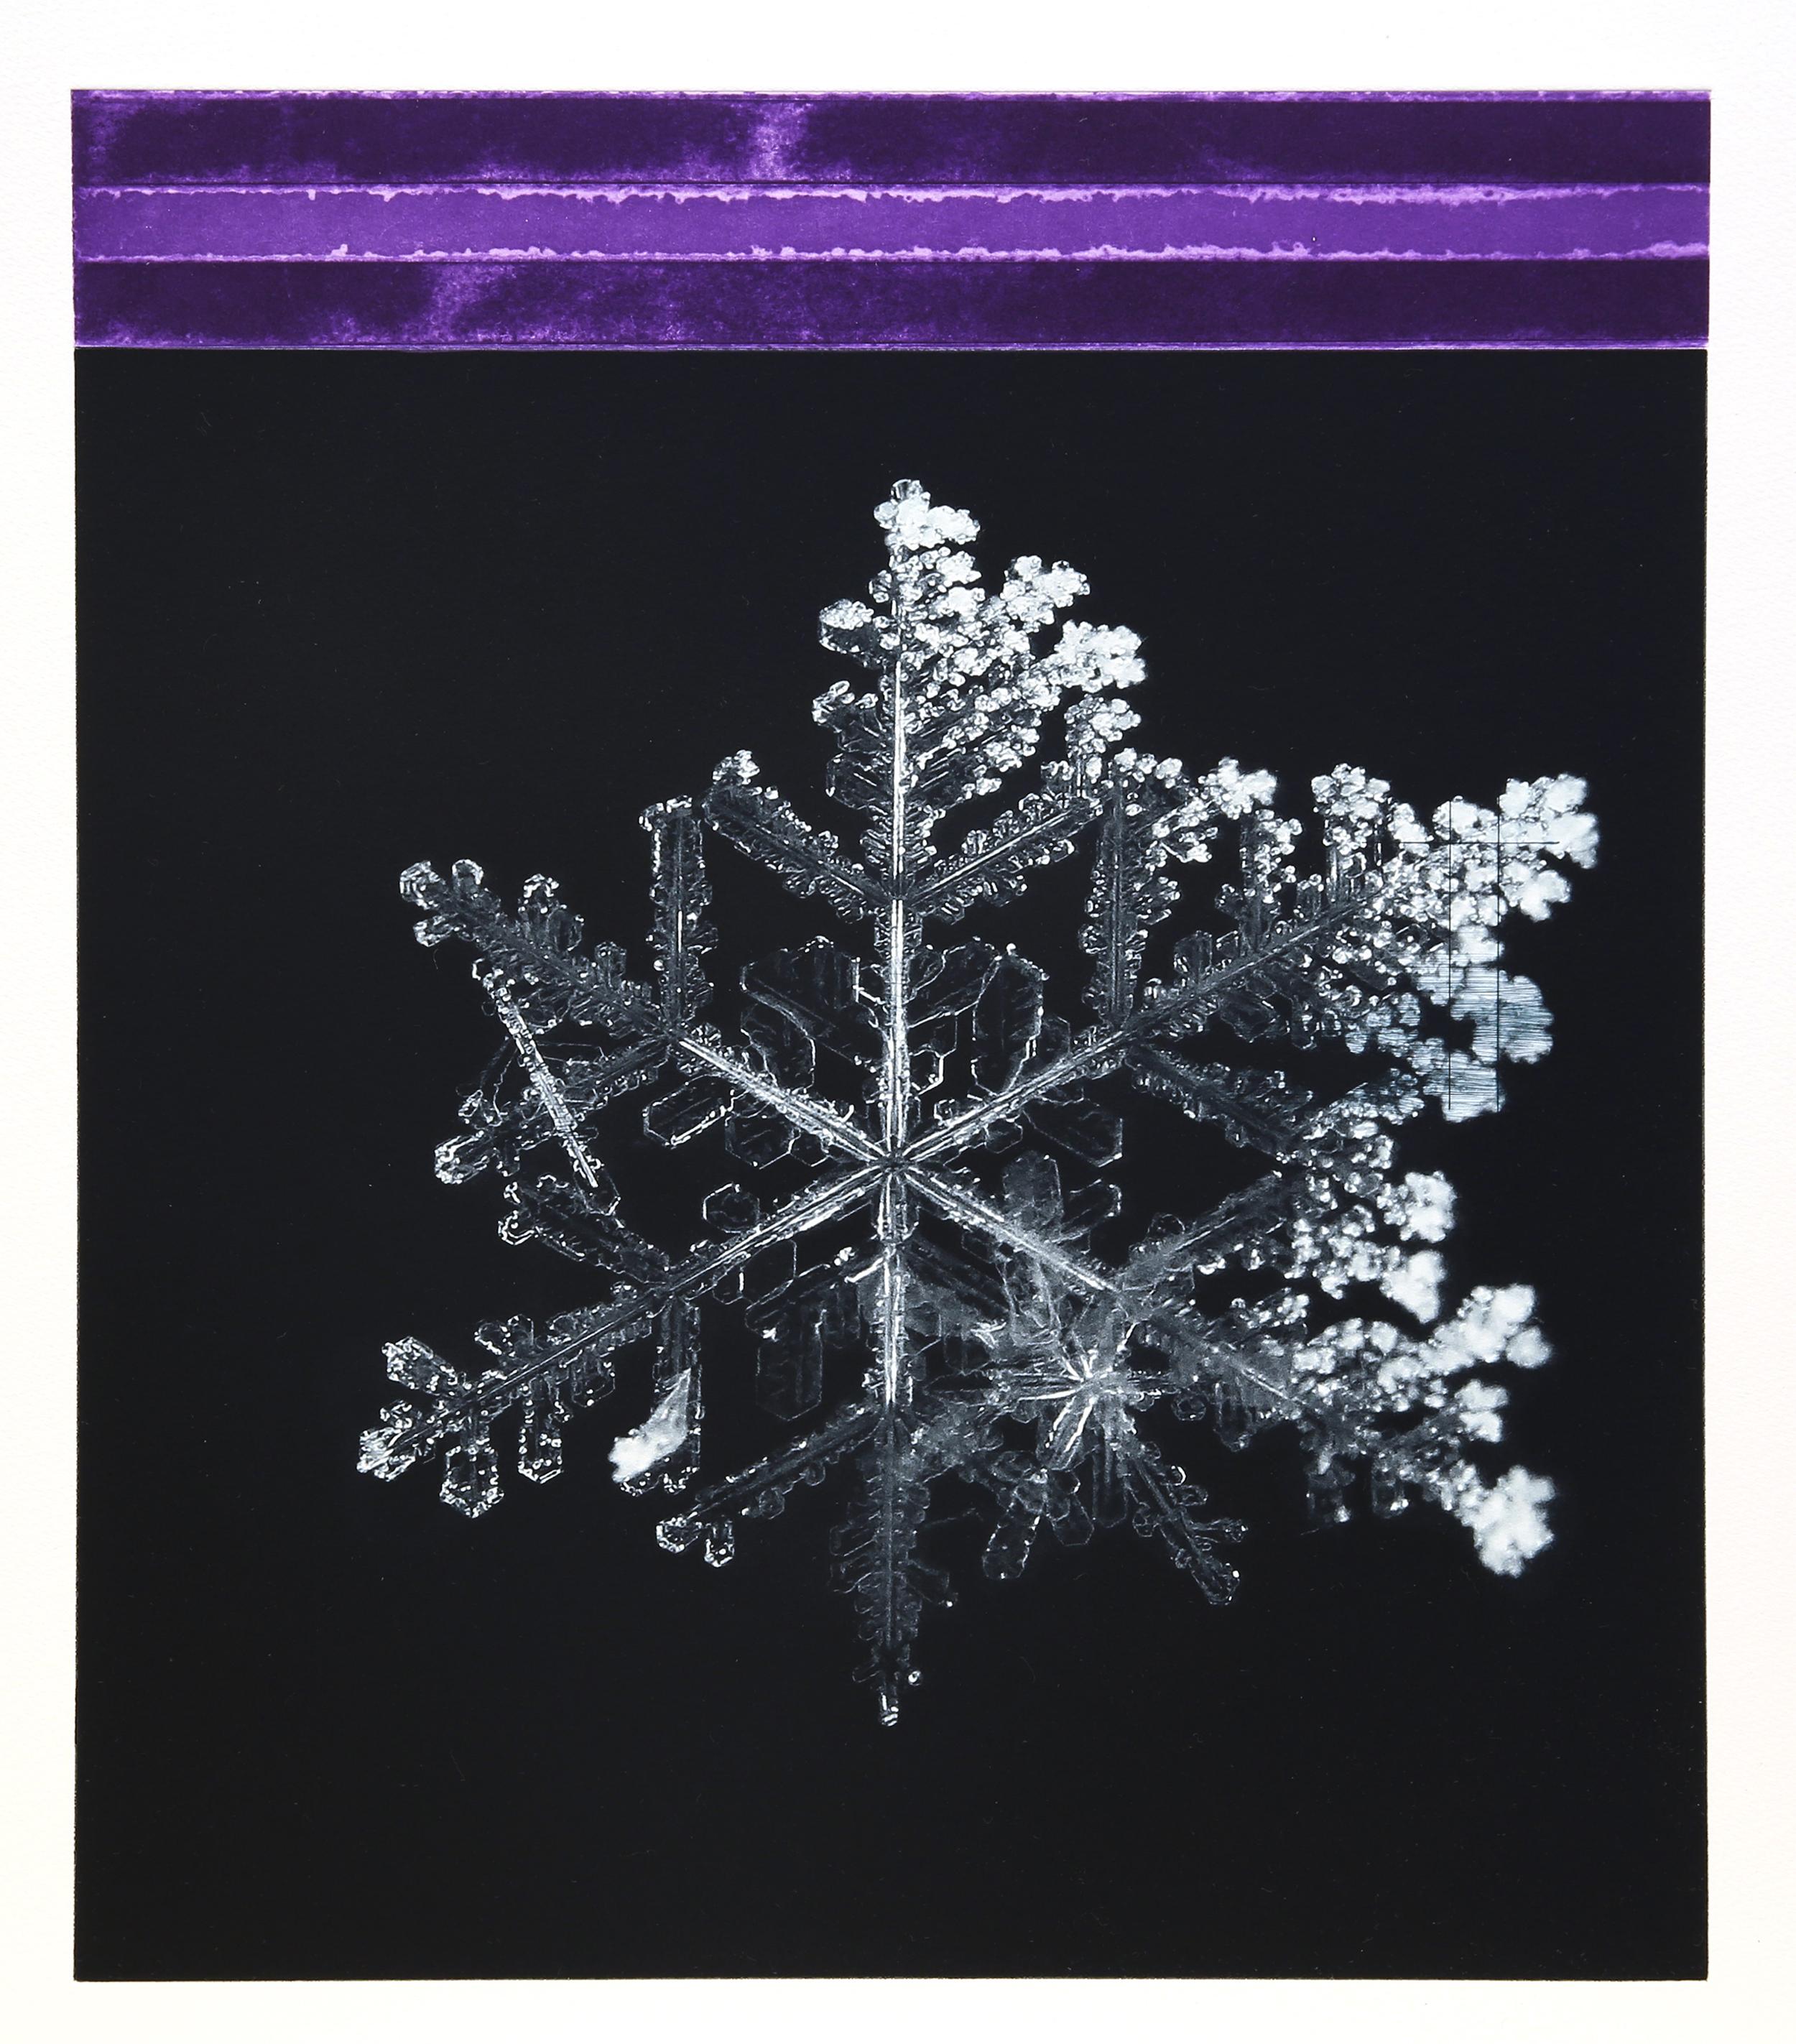 Crystal / Reservoir (Tesla) Violet  Polymer / Etching / Drypoint 40 x 45 cm / 15,7 x 17,7 in Edition of 40 + 7 Ap Editeur: Per Fronth / Atelje Ole Larsen / Helsingborg  38/2015: